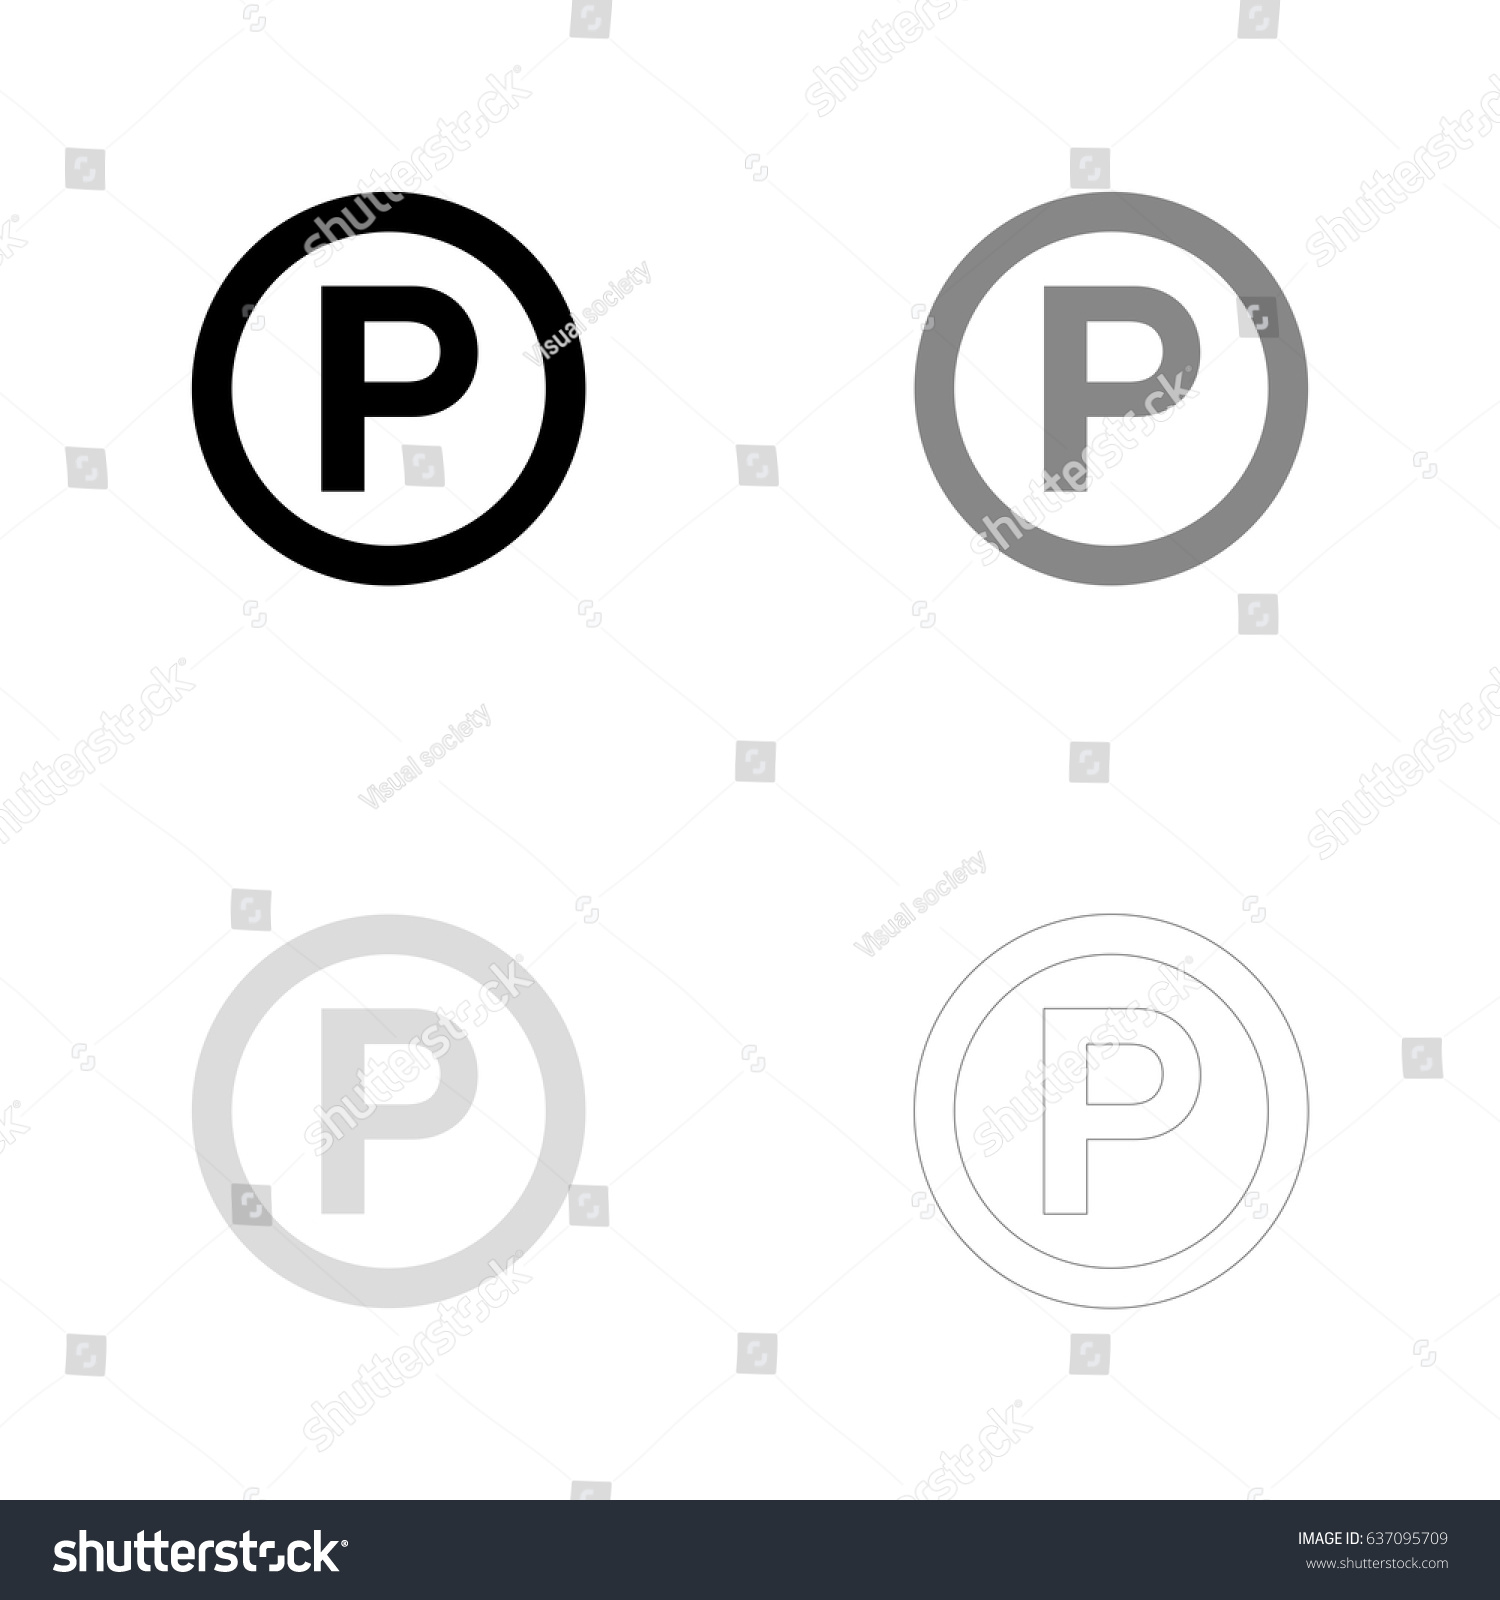 P Sound Recording Copyright Symbol Black Stock Vector Royalty Free